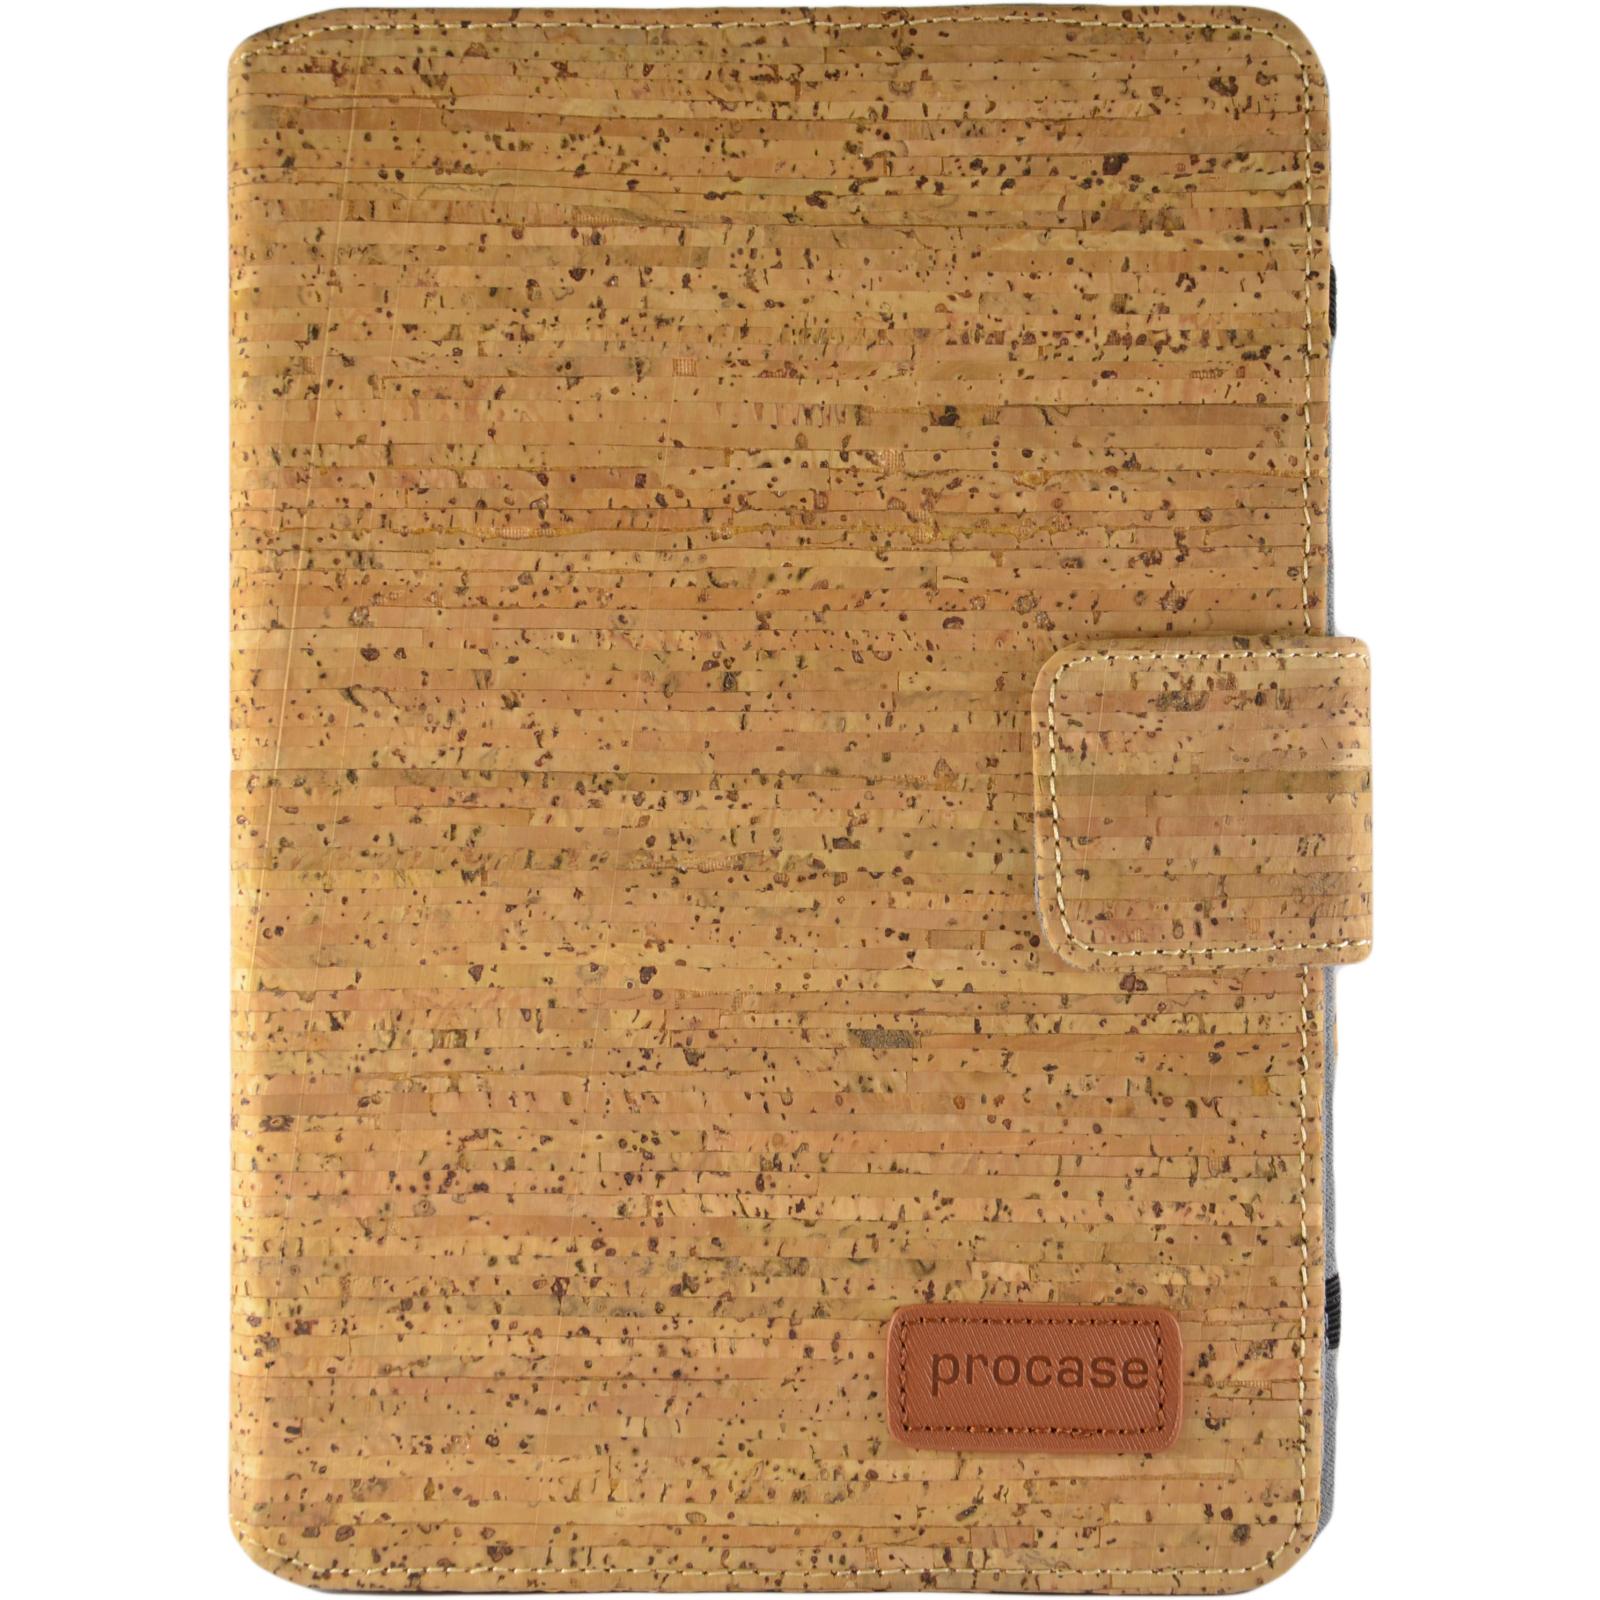 "Чехол для планшета Pro-case Чохол планшету унiверсальний Pro-case Cork case 7-8"" beige (UNS-045)"